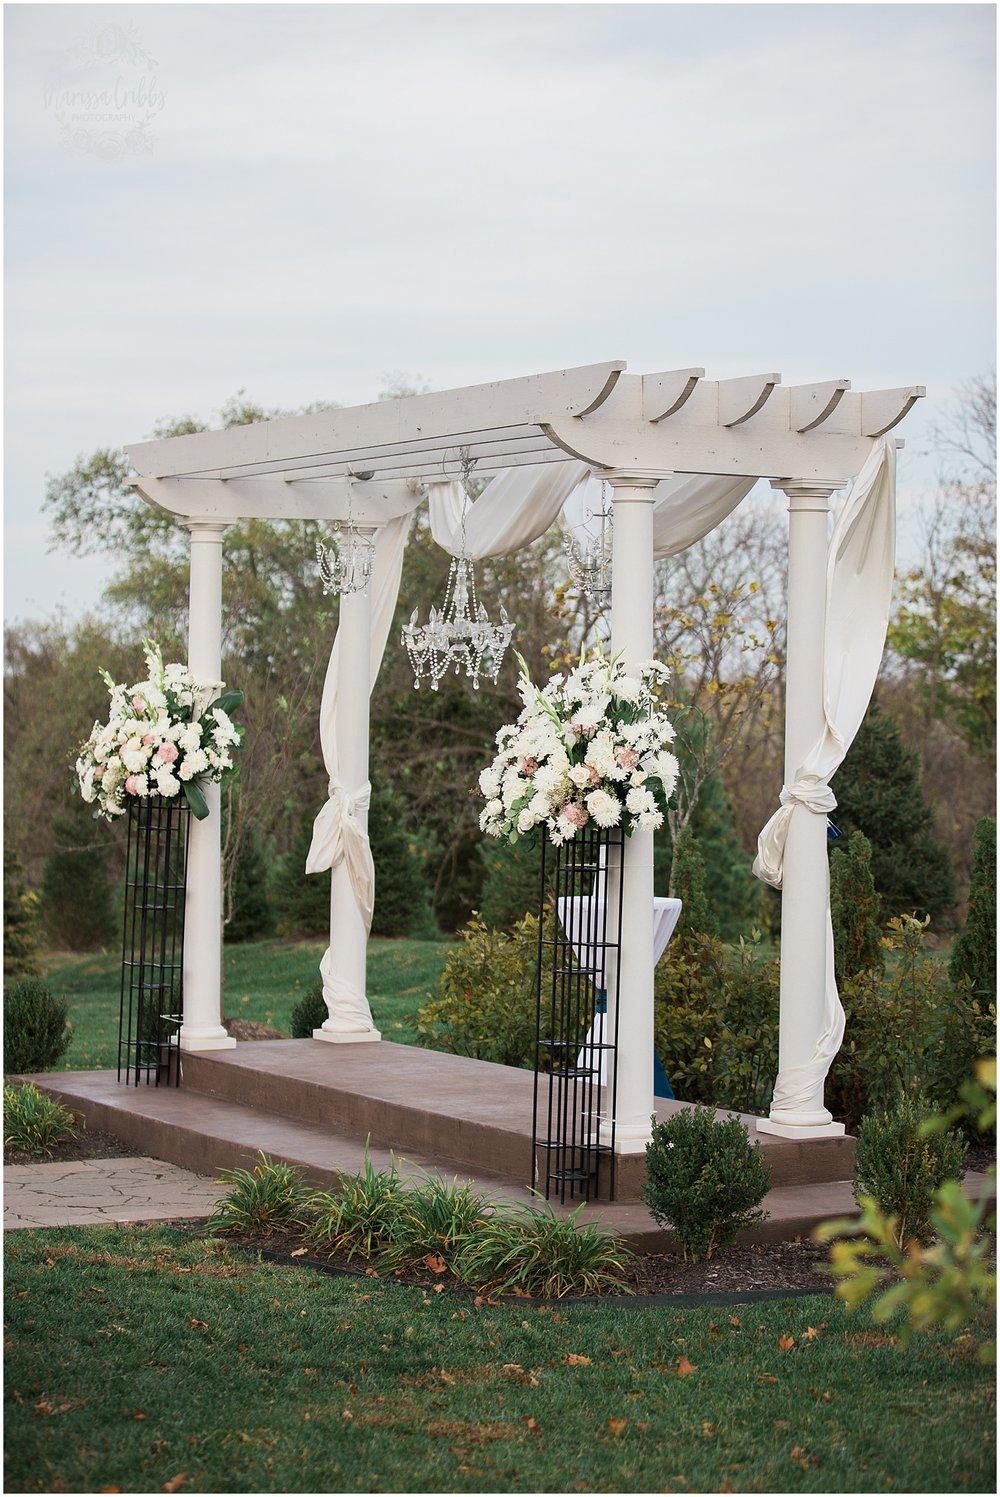 Alex & Amie | Eighteen Ninety Event Space | Marissa Cribbs Photography | Kansas City Perfect Wedding Guide_1329.jpg